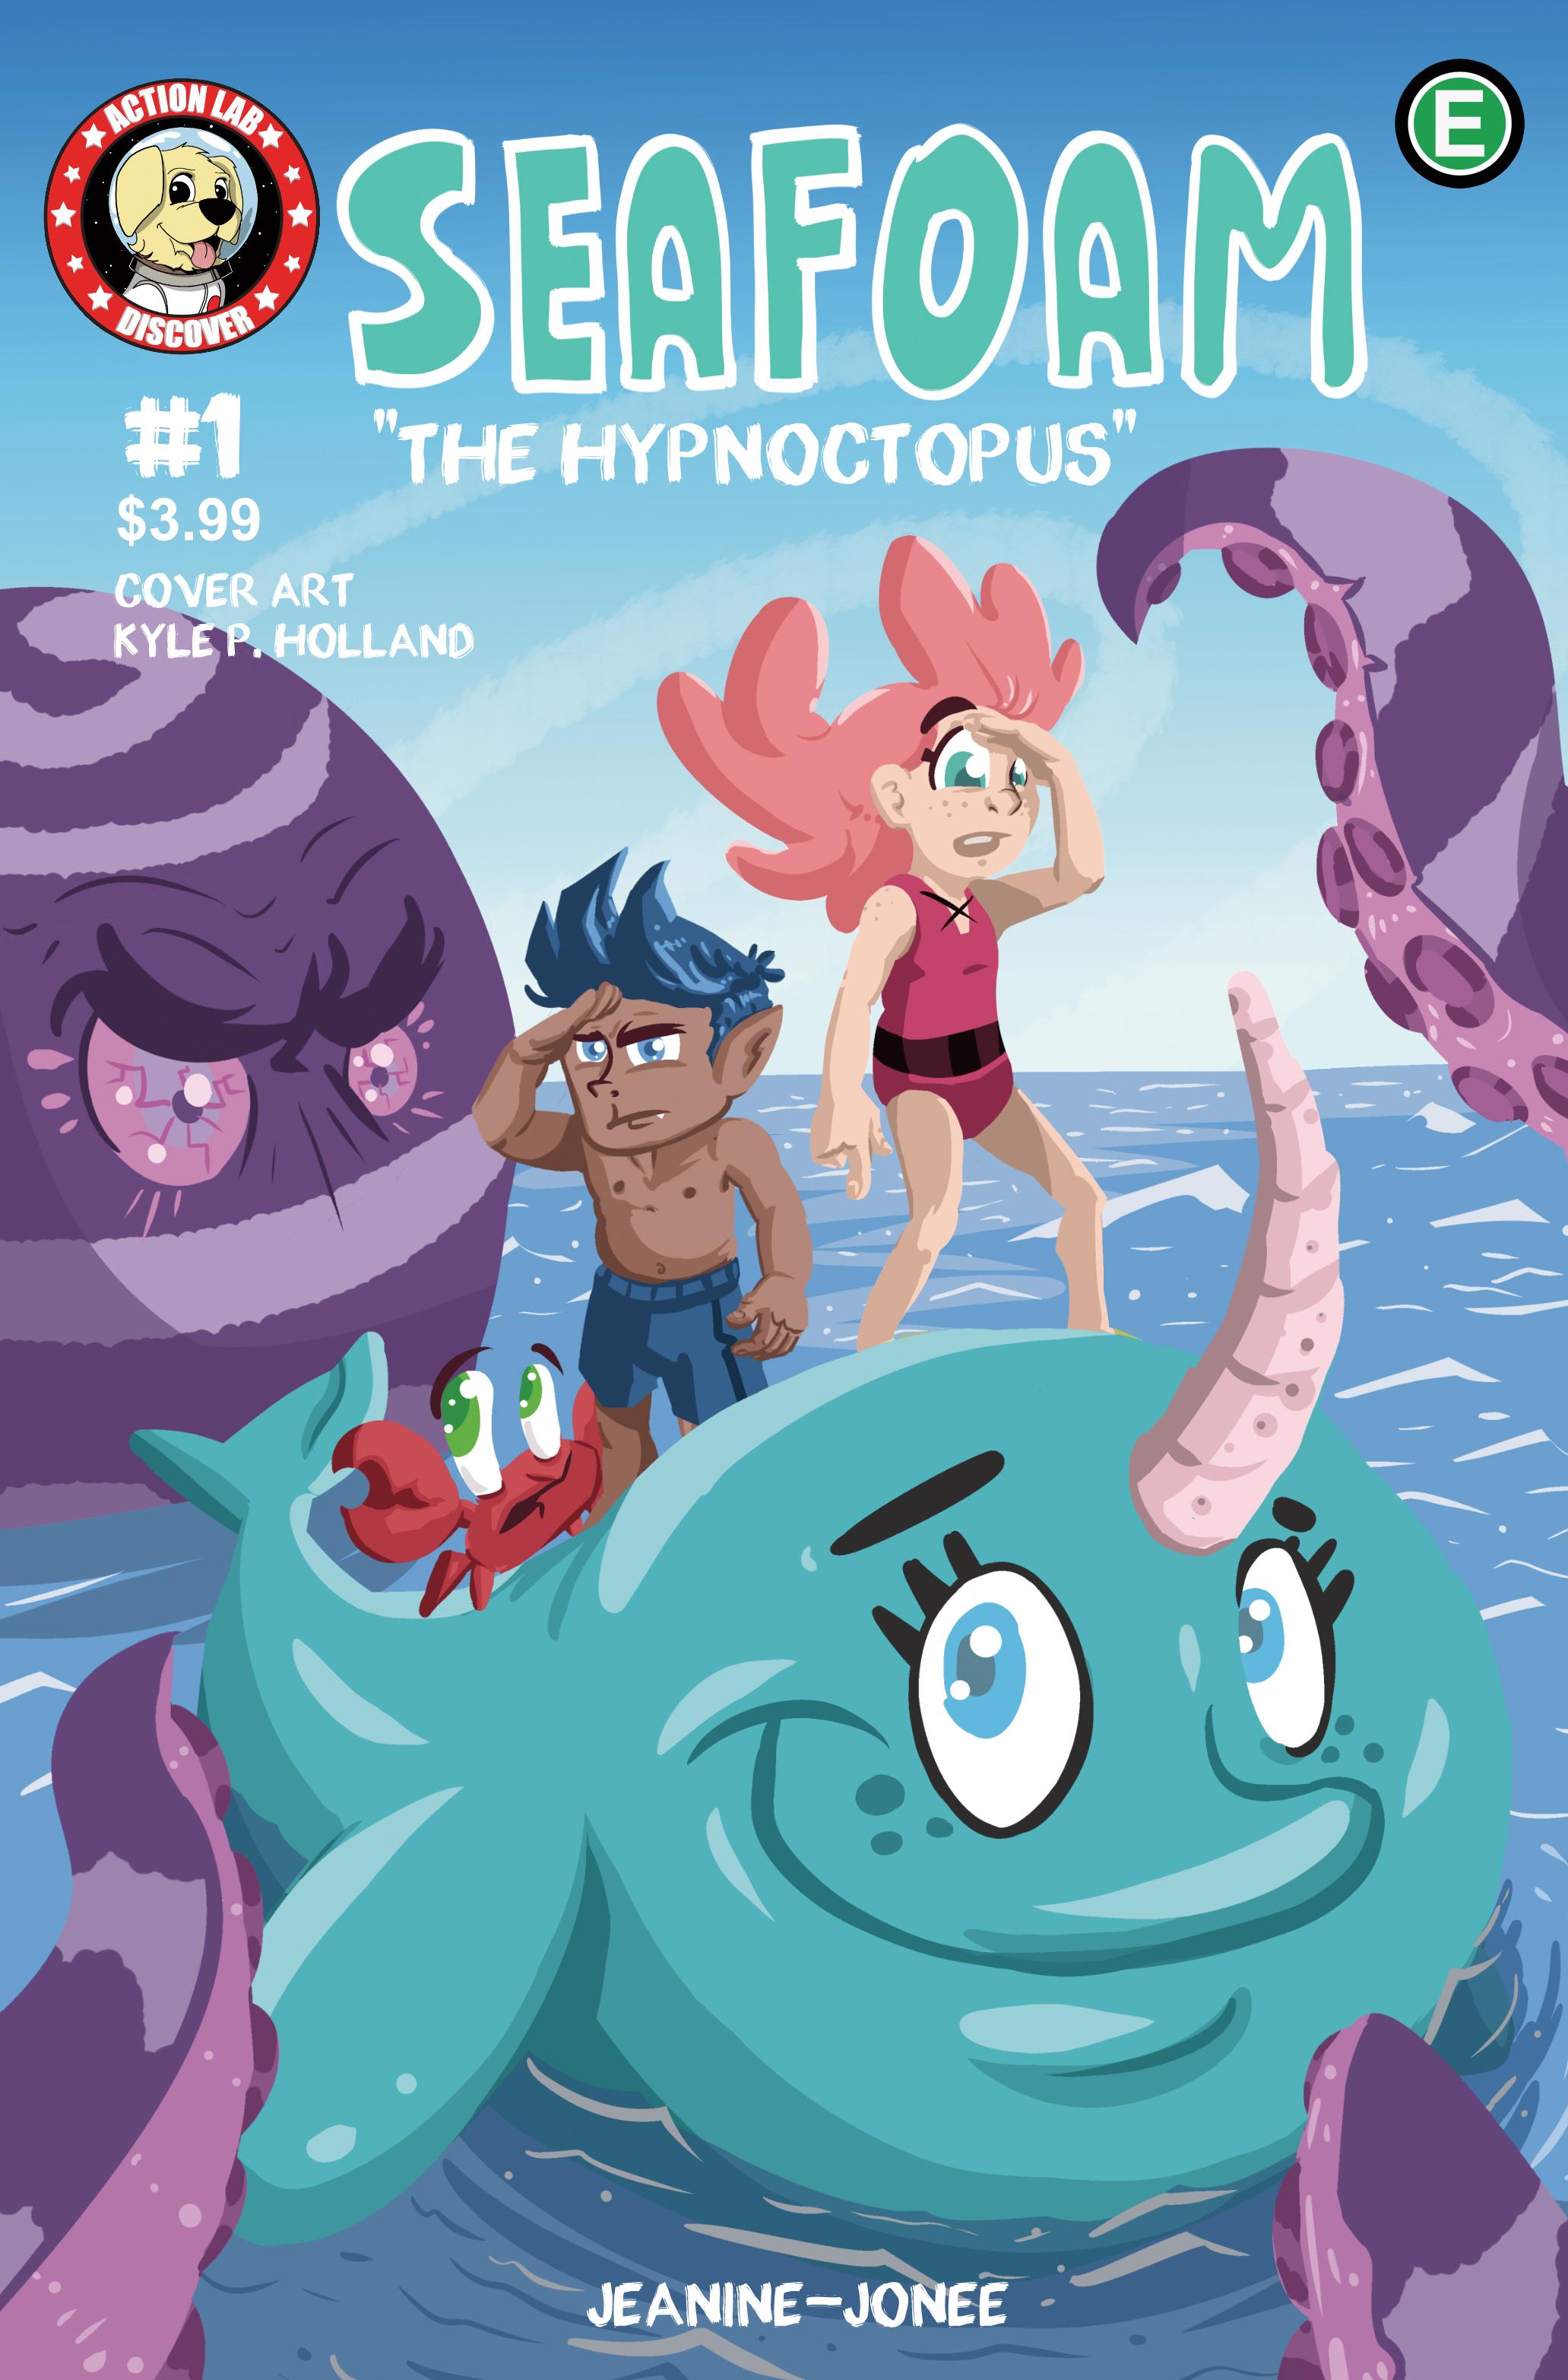 Seafoam A Friend for Madison #1 Cover B.jpg